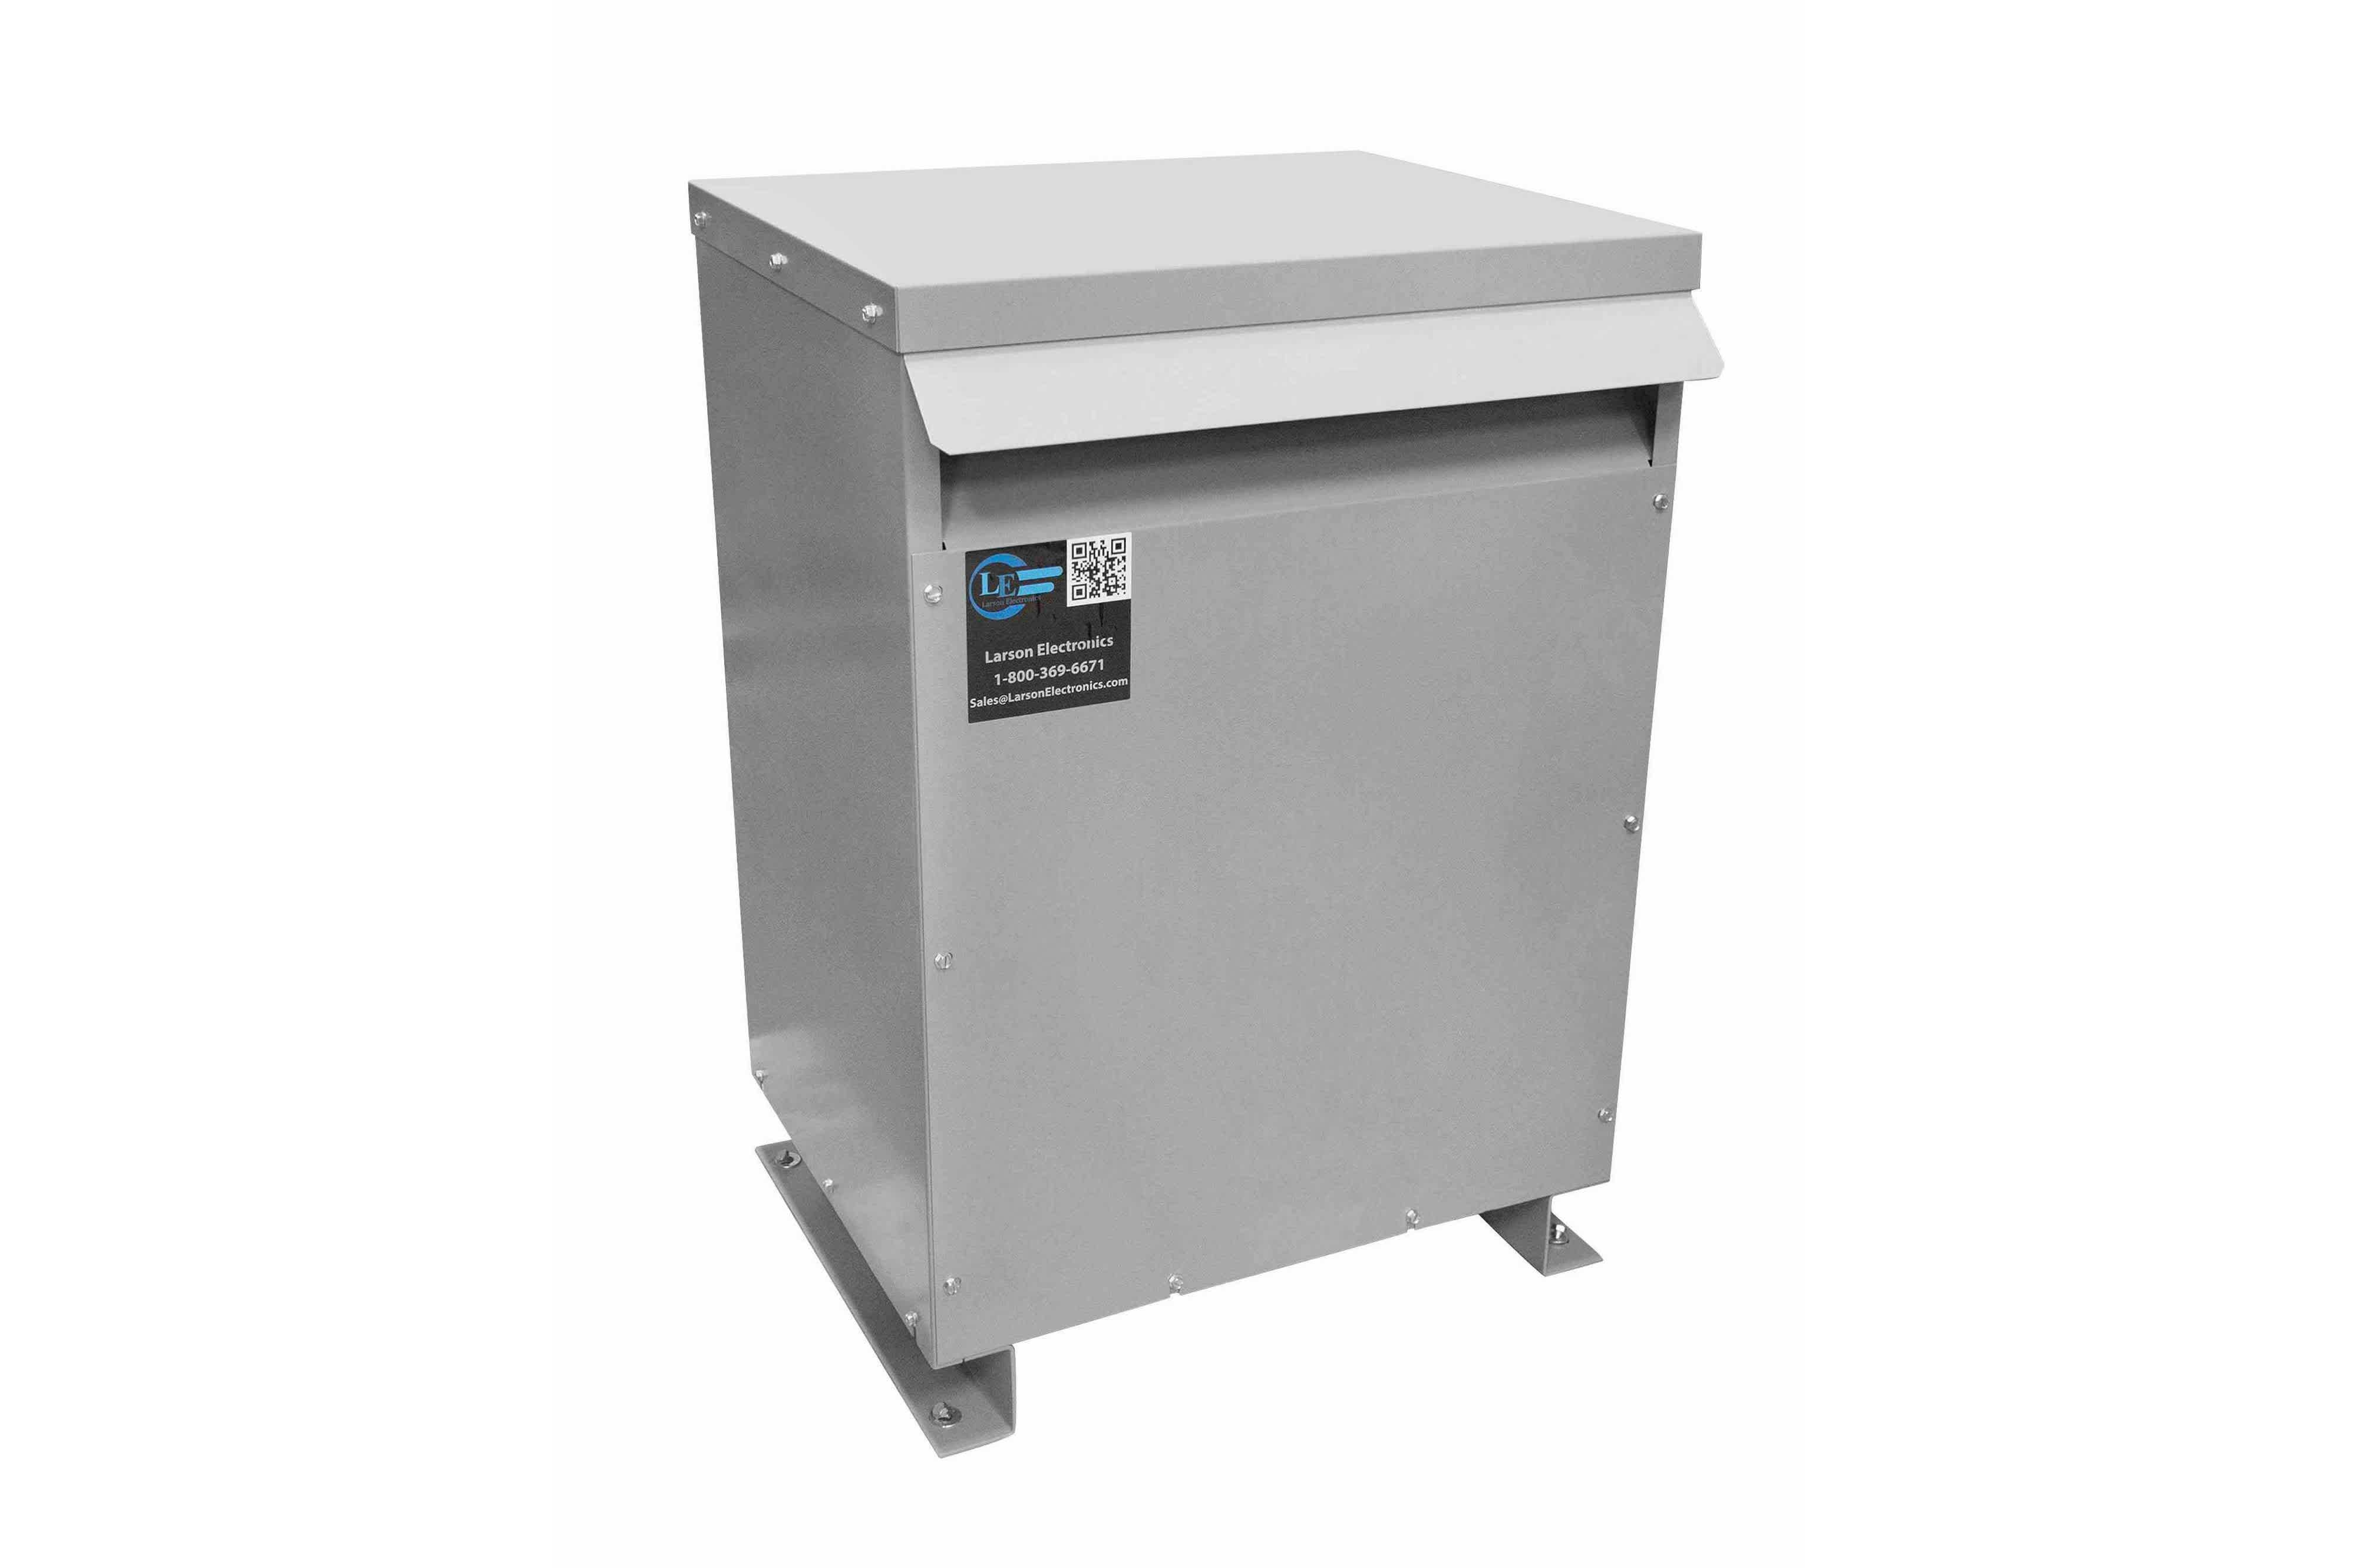 9 kVA 3PH Isolation Transformer, 440V Wye Primary, 240V/120 Delta Secondary, N3R, Ventilated, 60 Hz